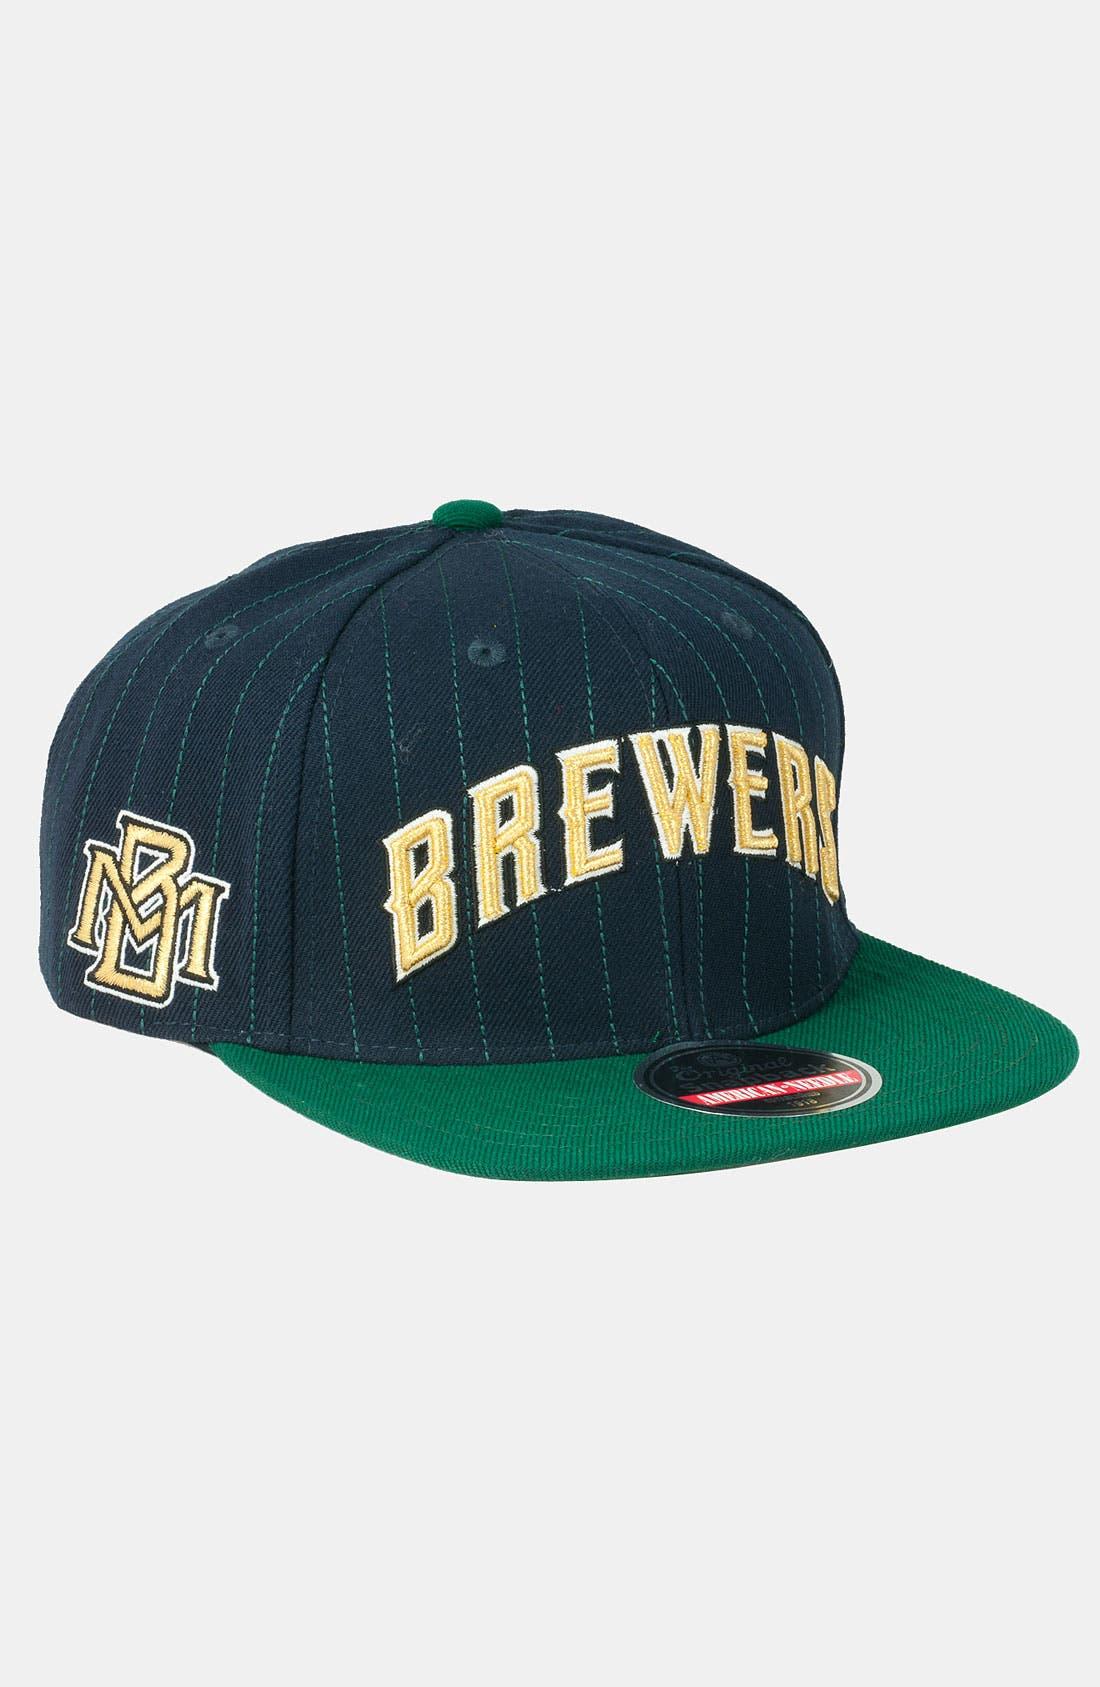 Alternate Image 1 Selected - American Needle 'Brewers' Snapback Baseball Cap